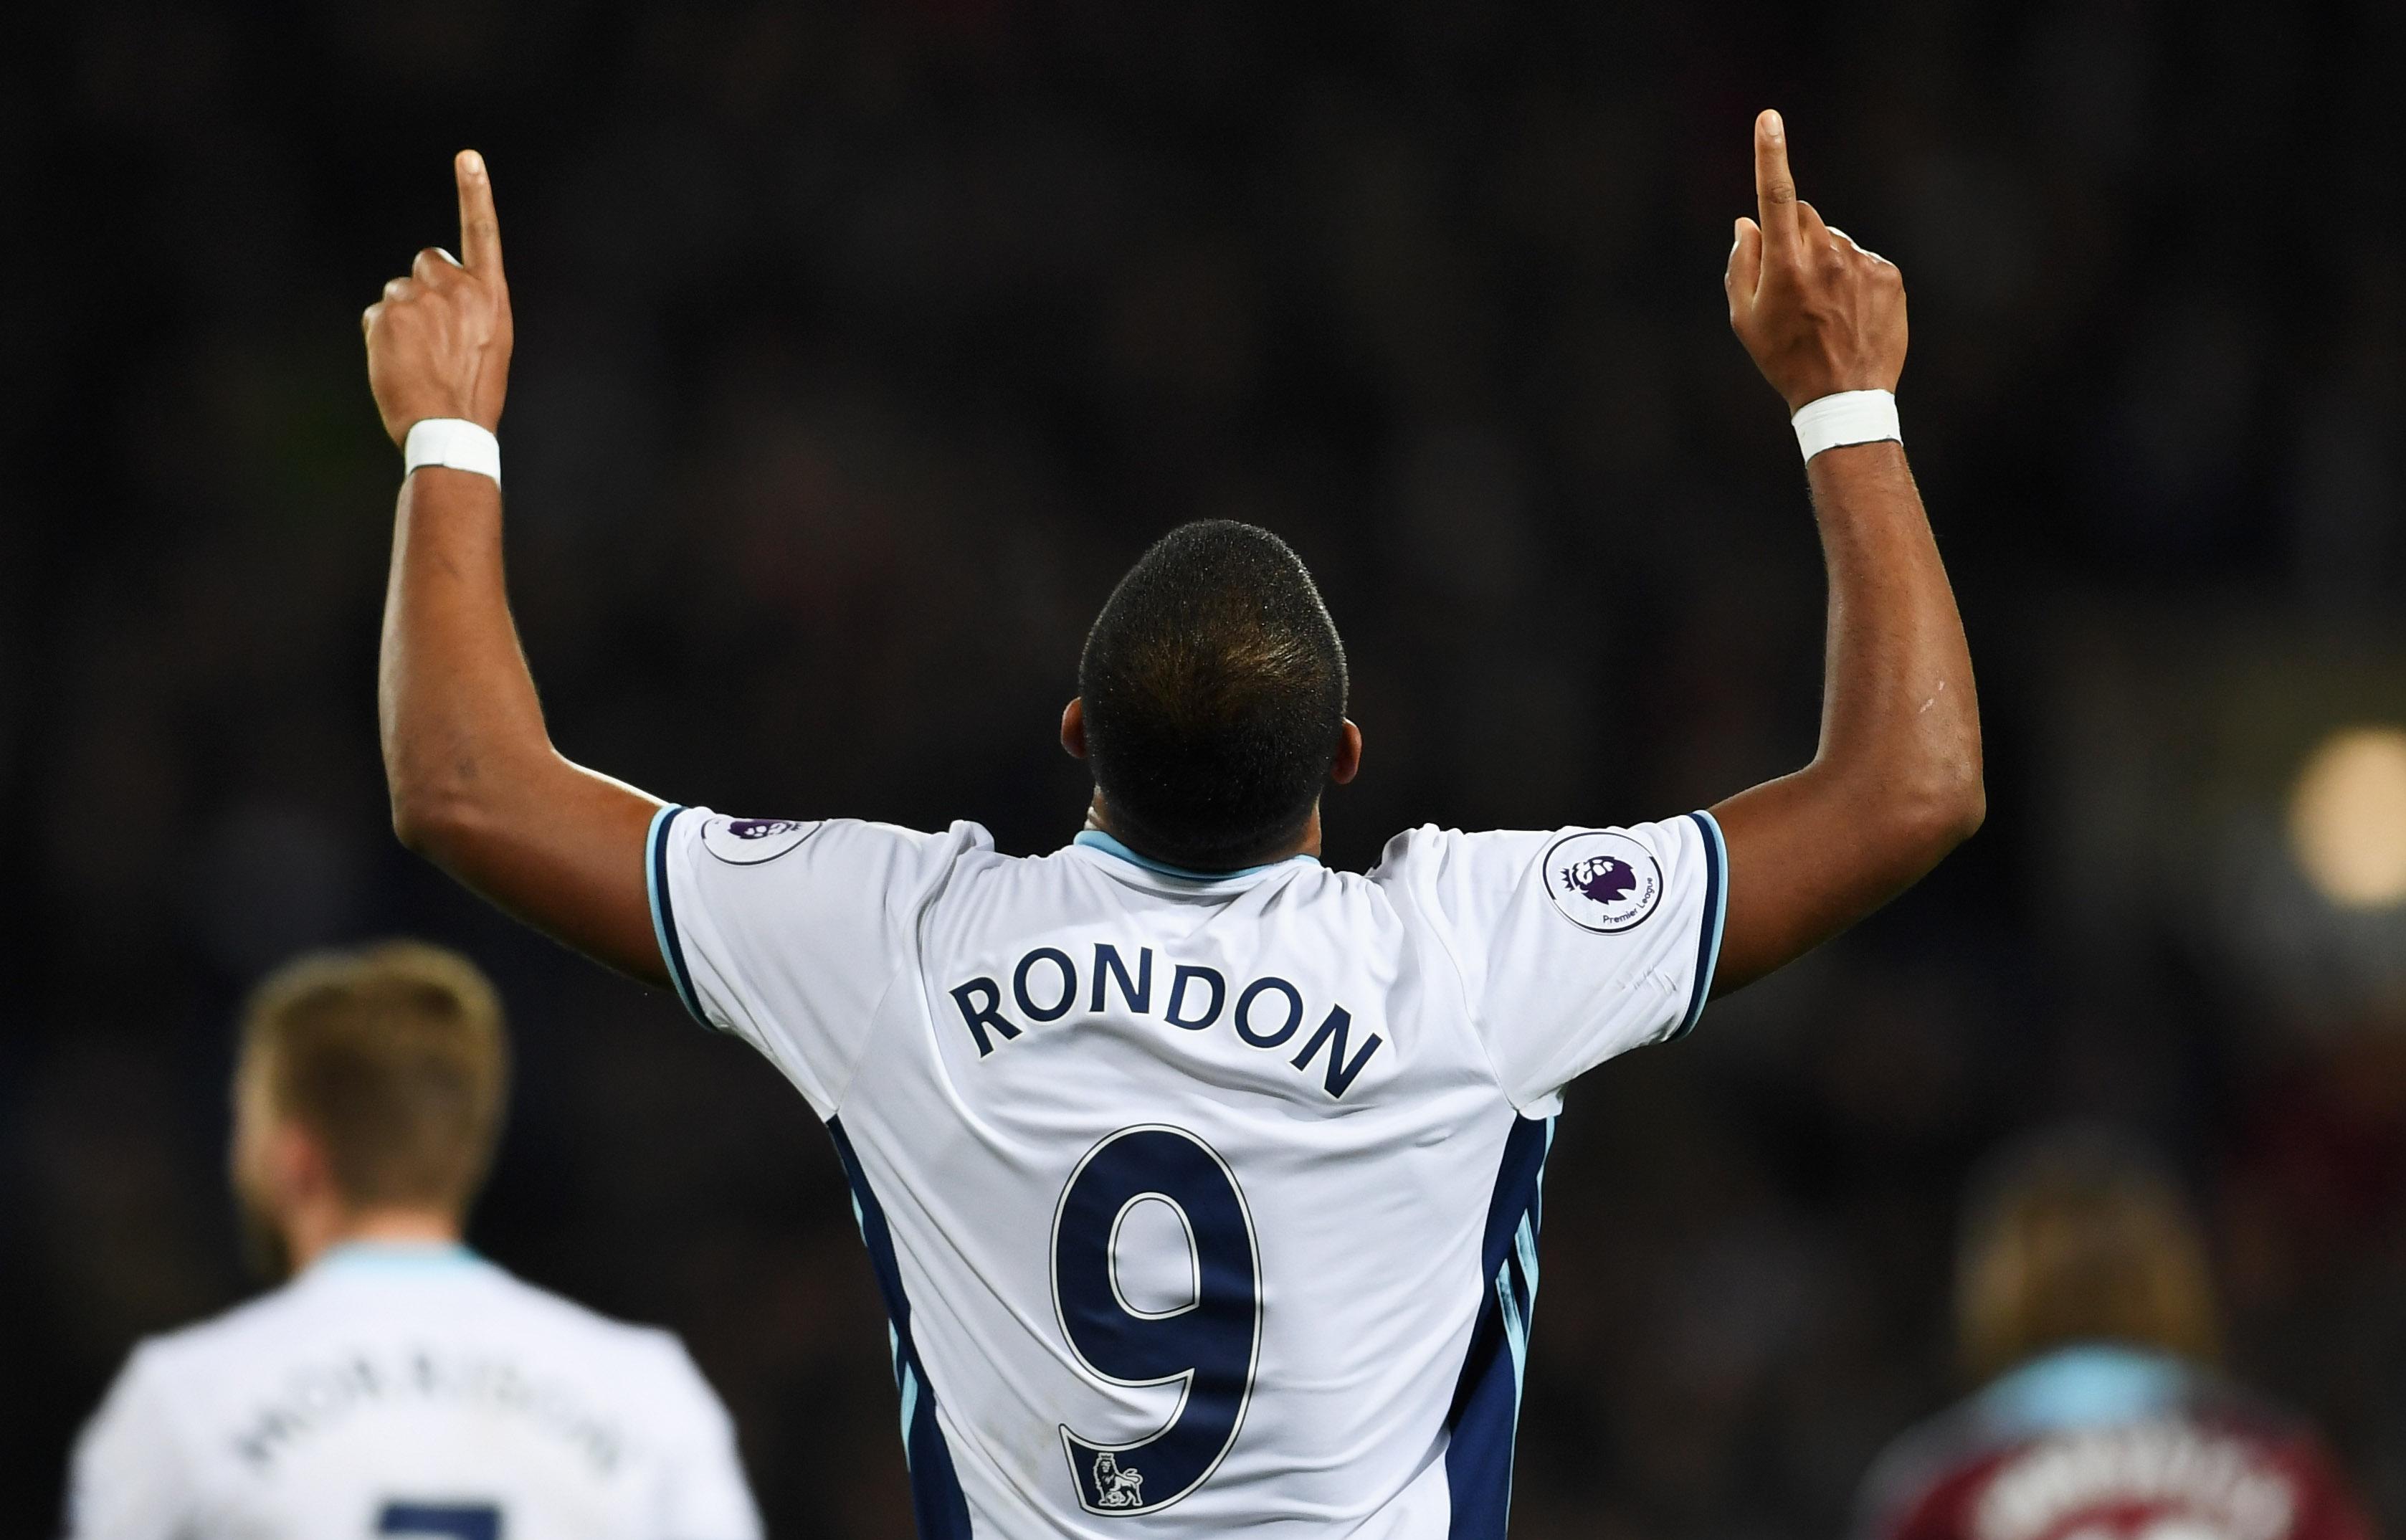 Salomon Rondon stars as Baggies leap into Premier League top half